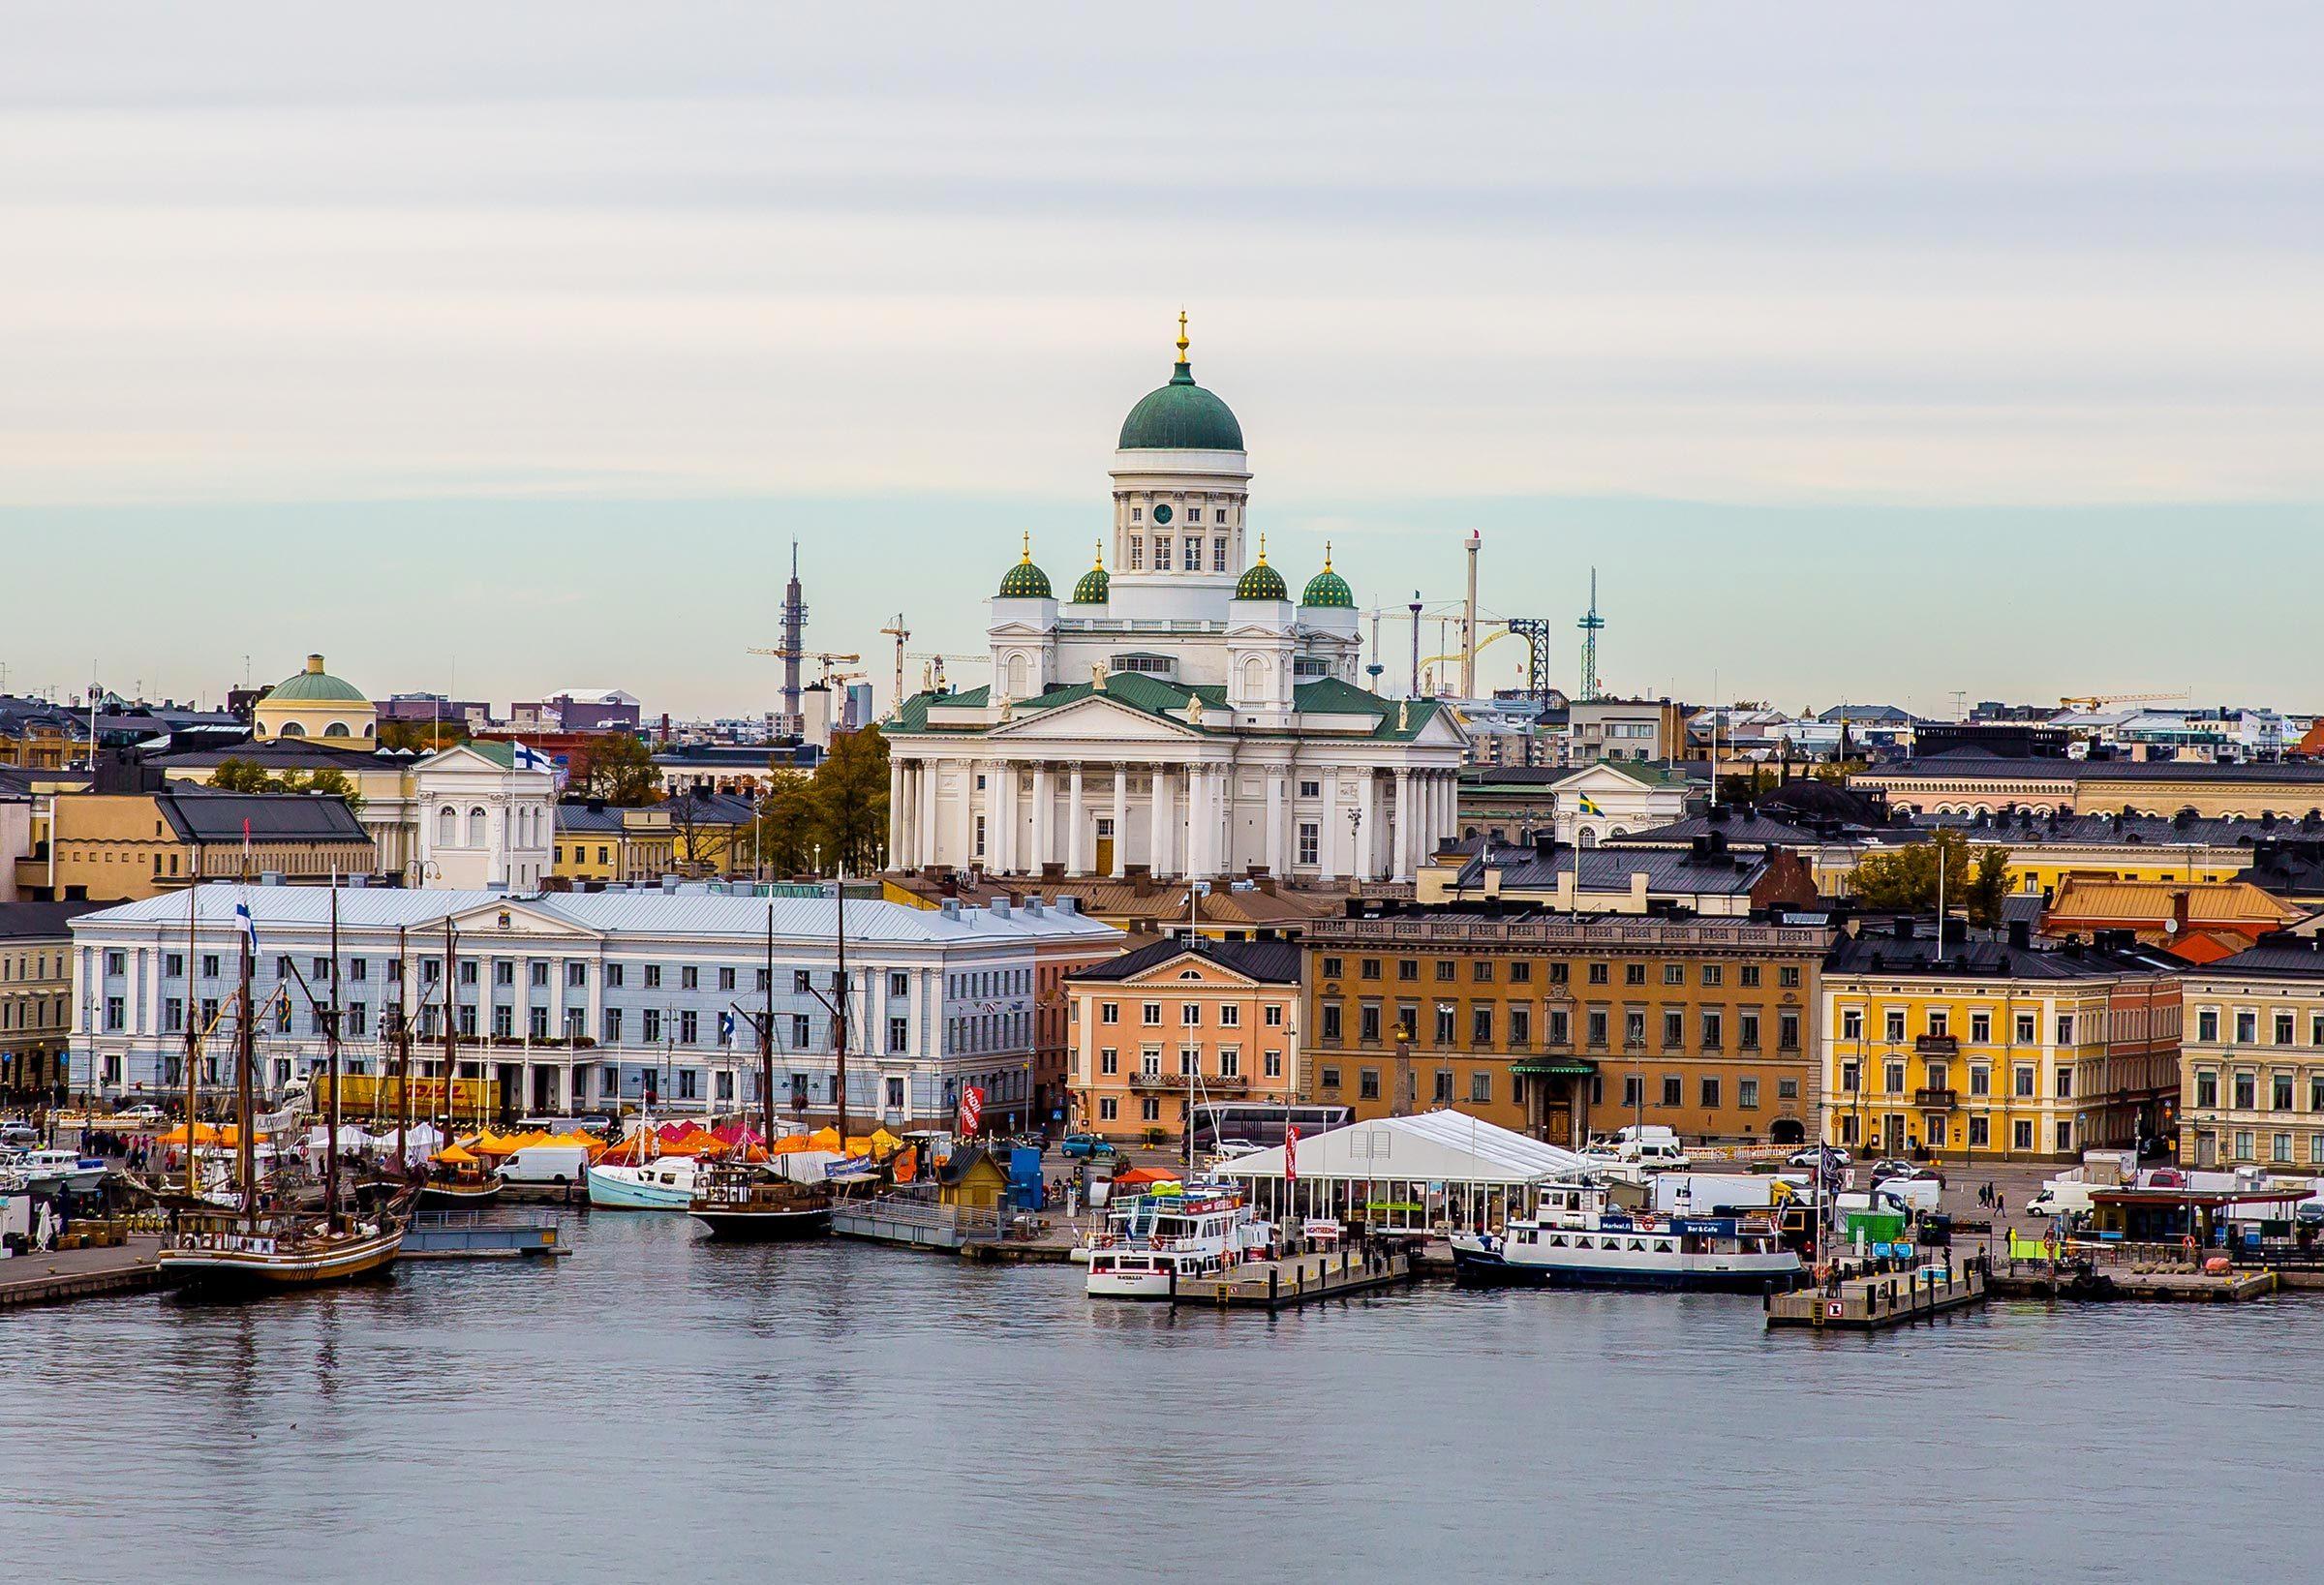 Villes les moins polluées : Helsinki, Finlande.